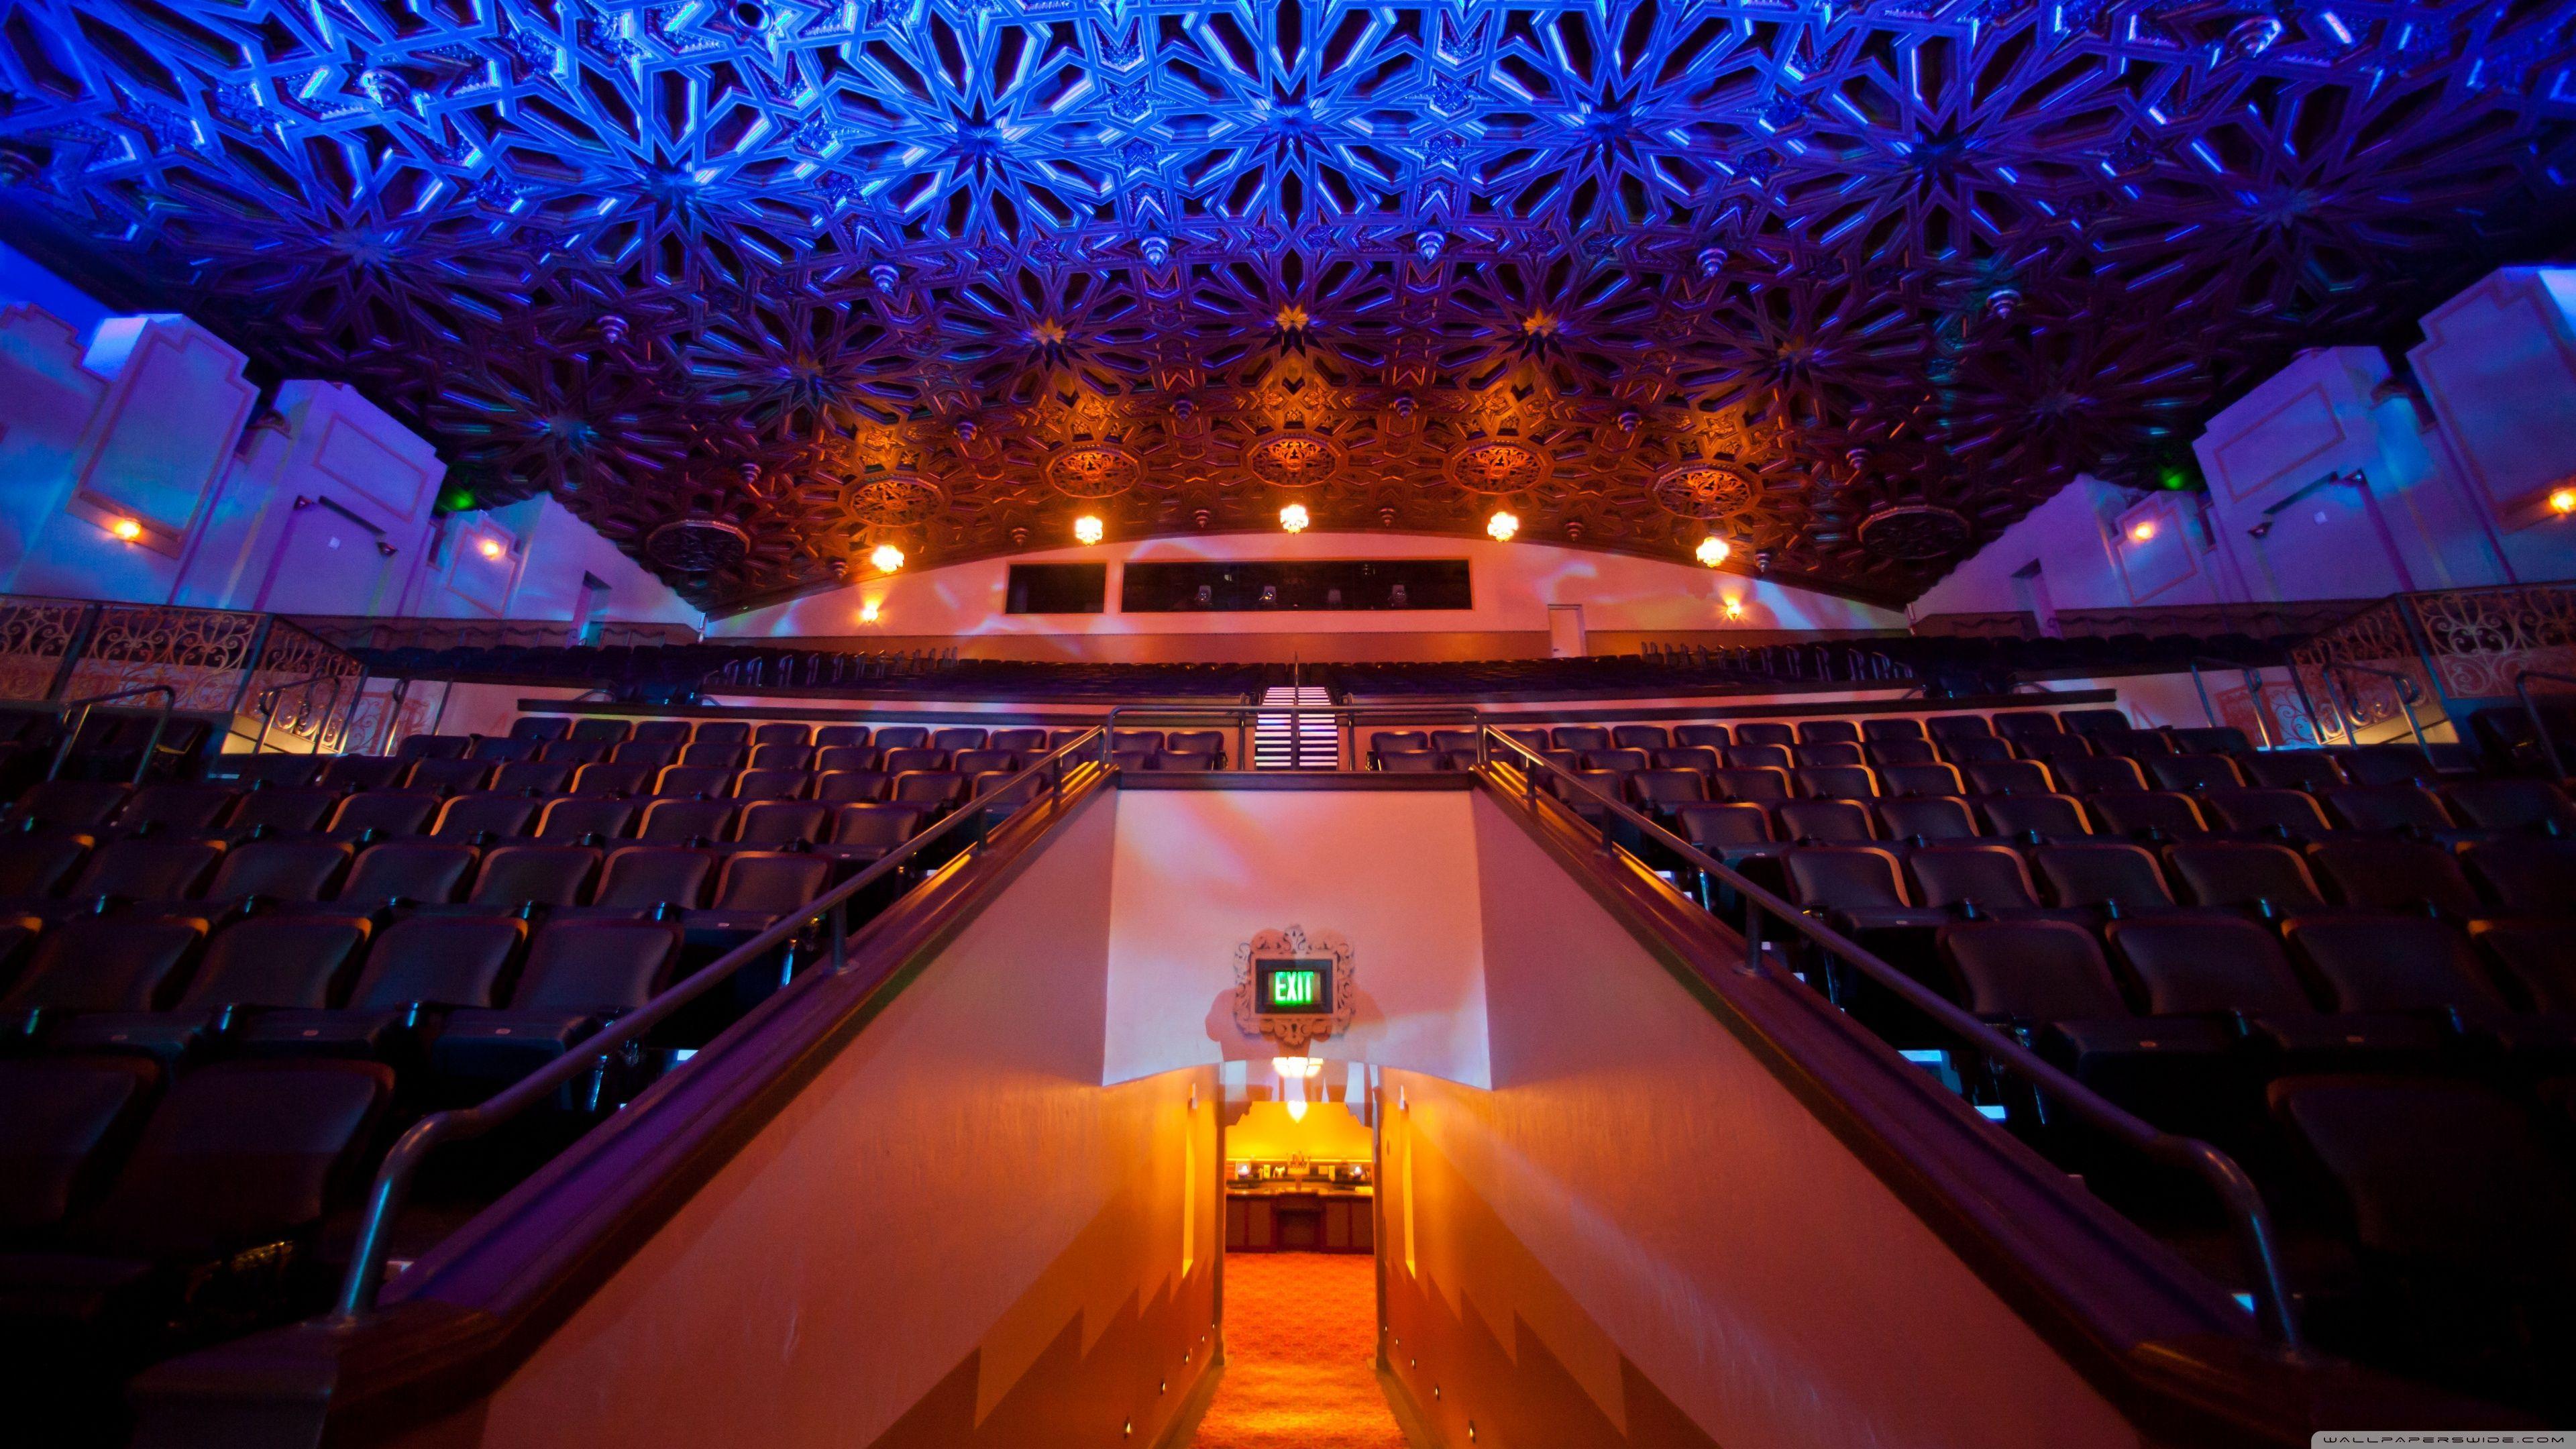 Cinema 4k Wallpapers Top Free Cinema 4k Backgrounds